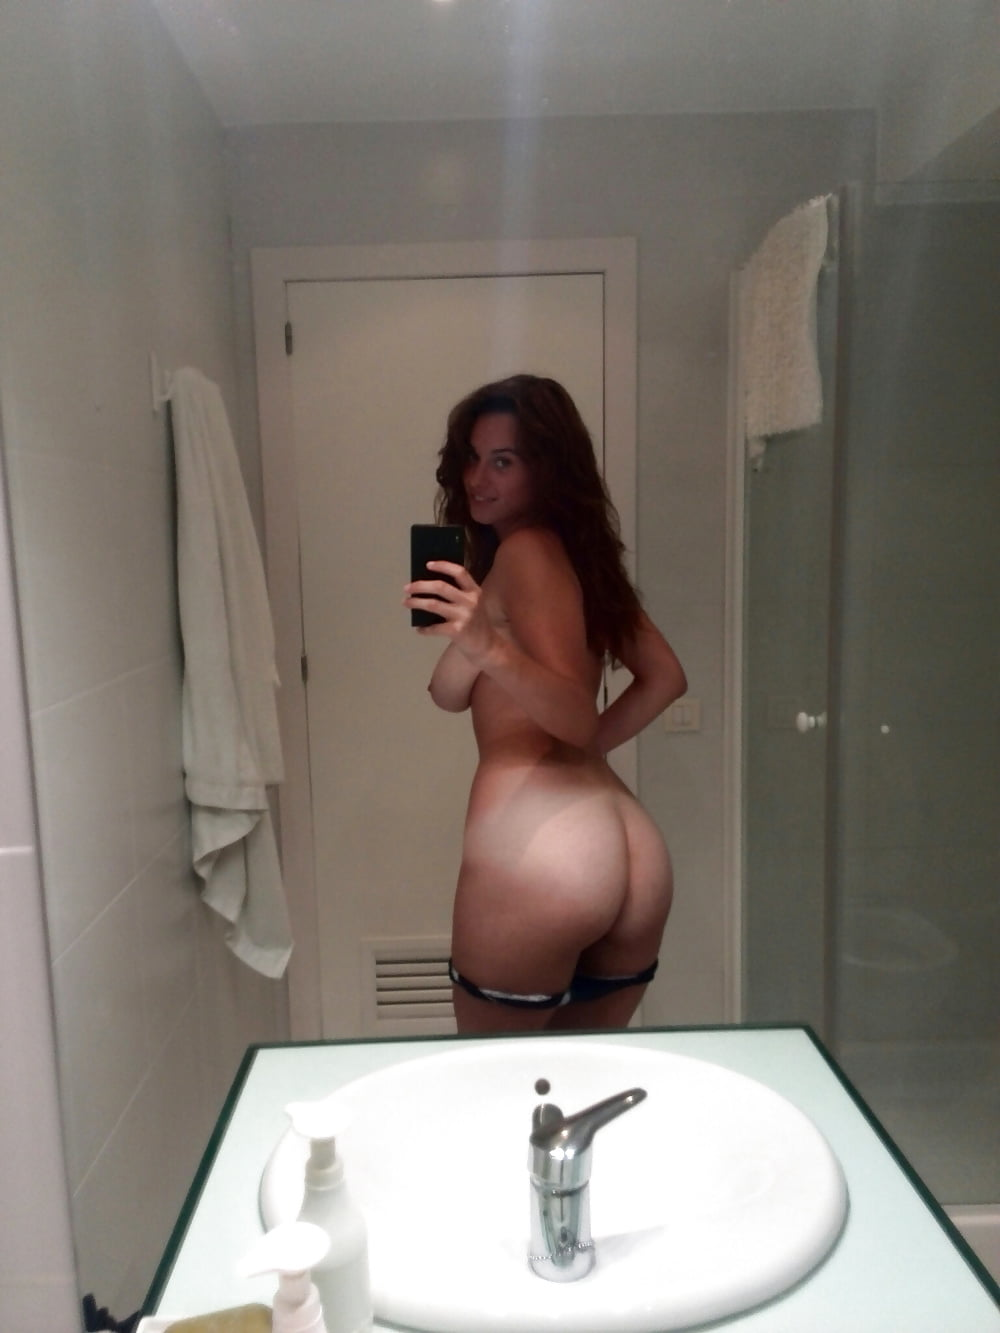 nude-big-booty-teen-self-pic-unsensored-sex-video-search